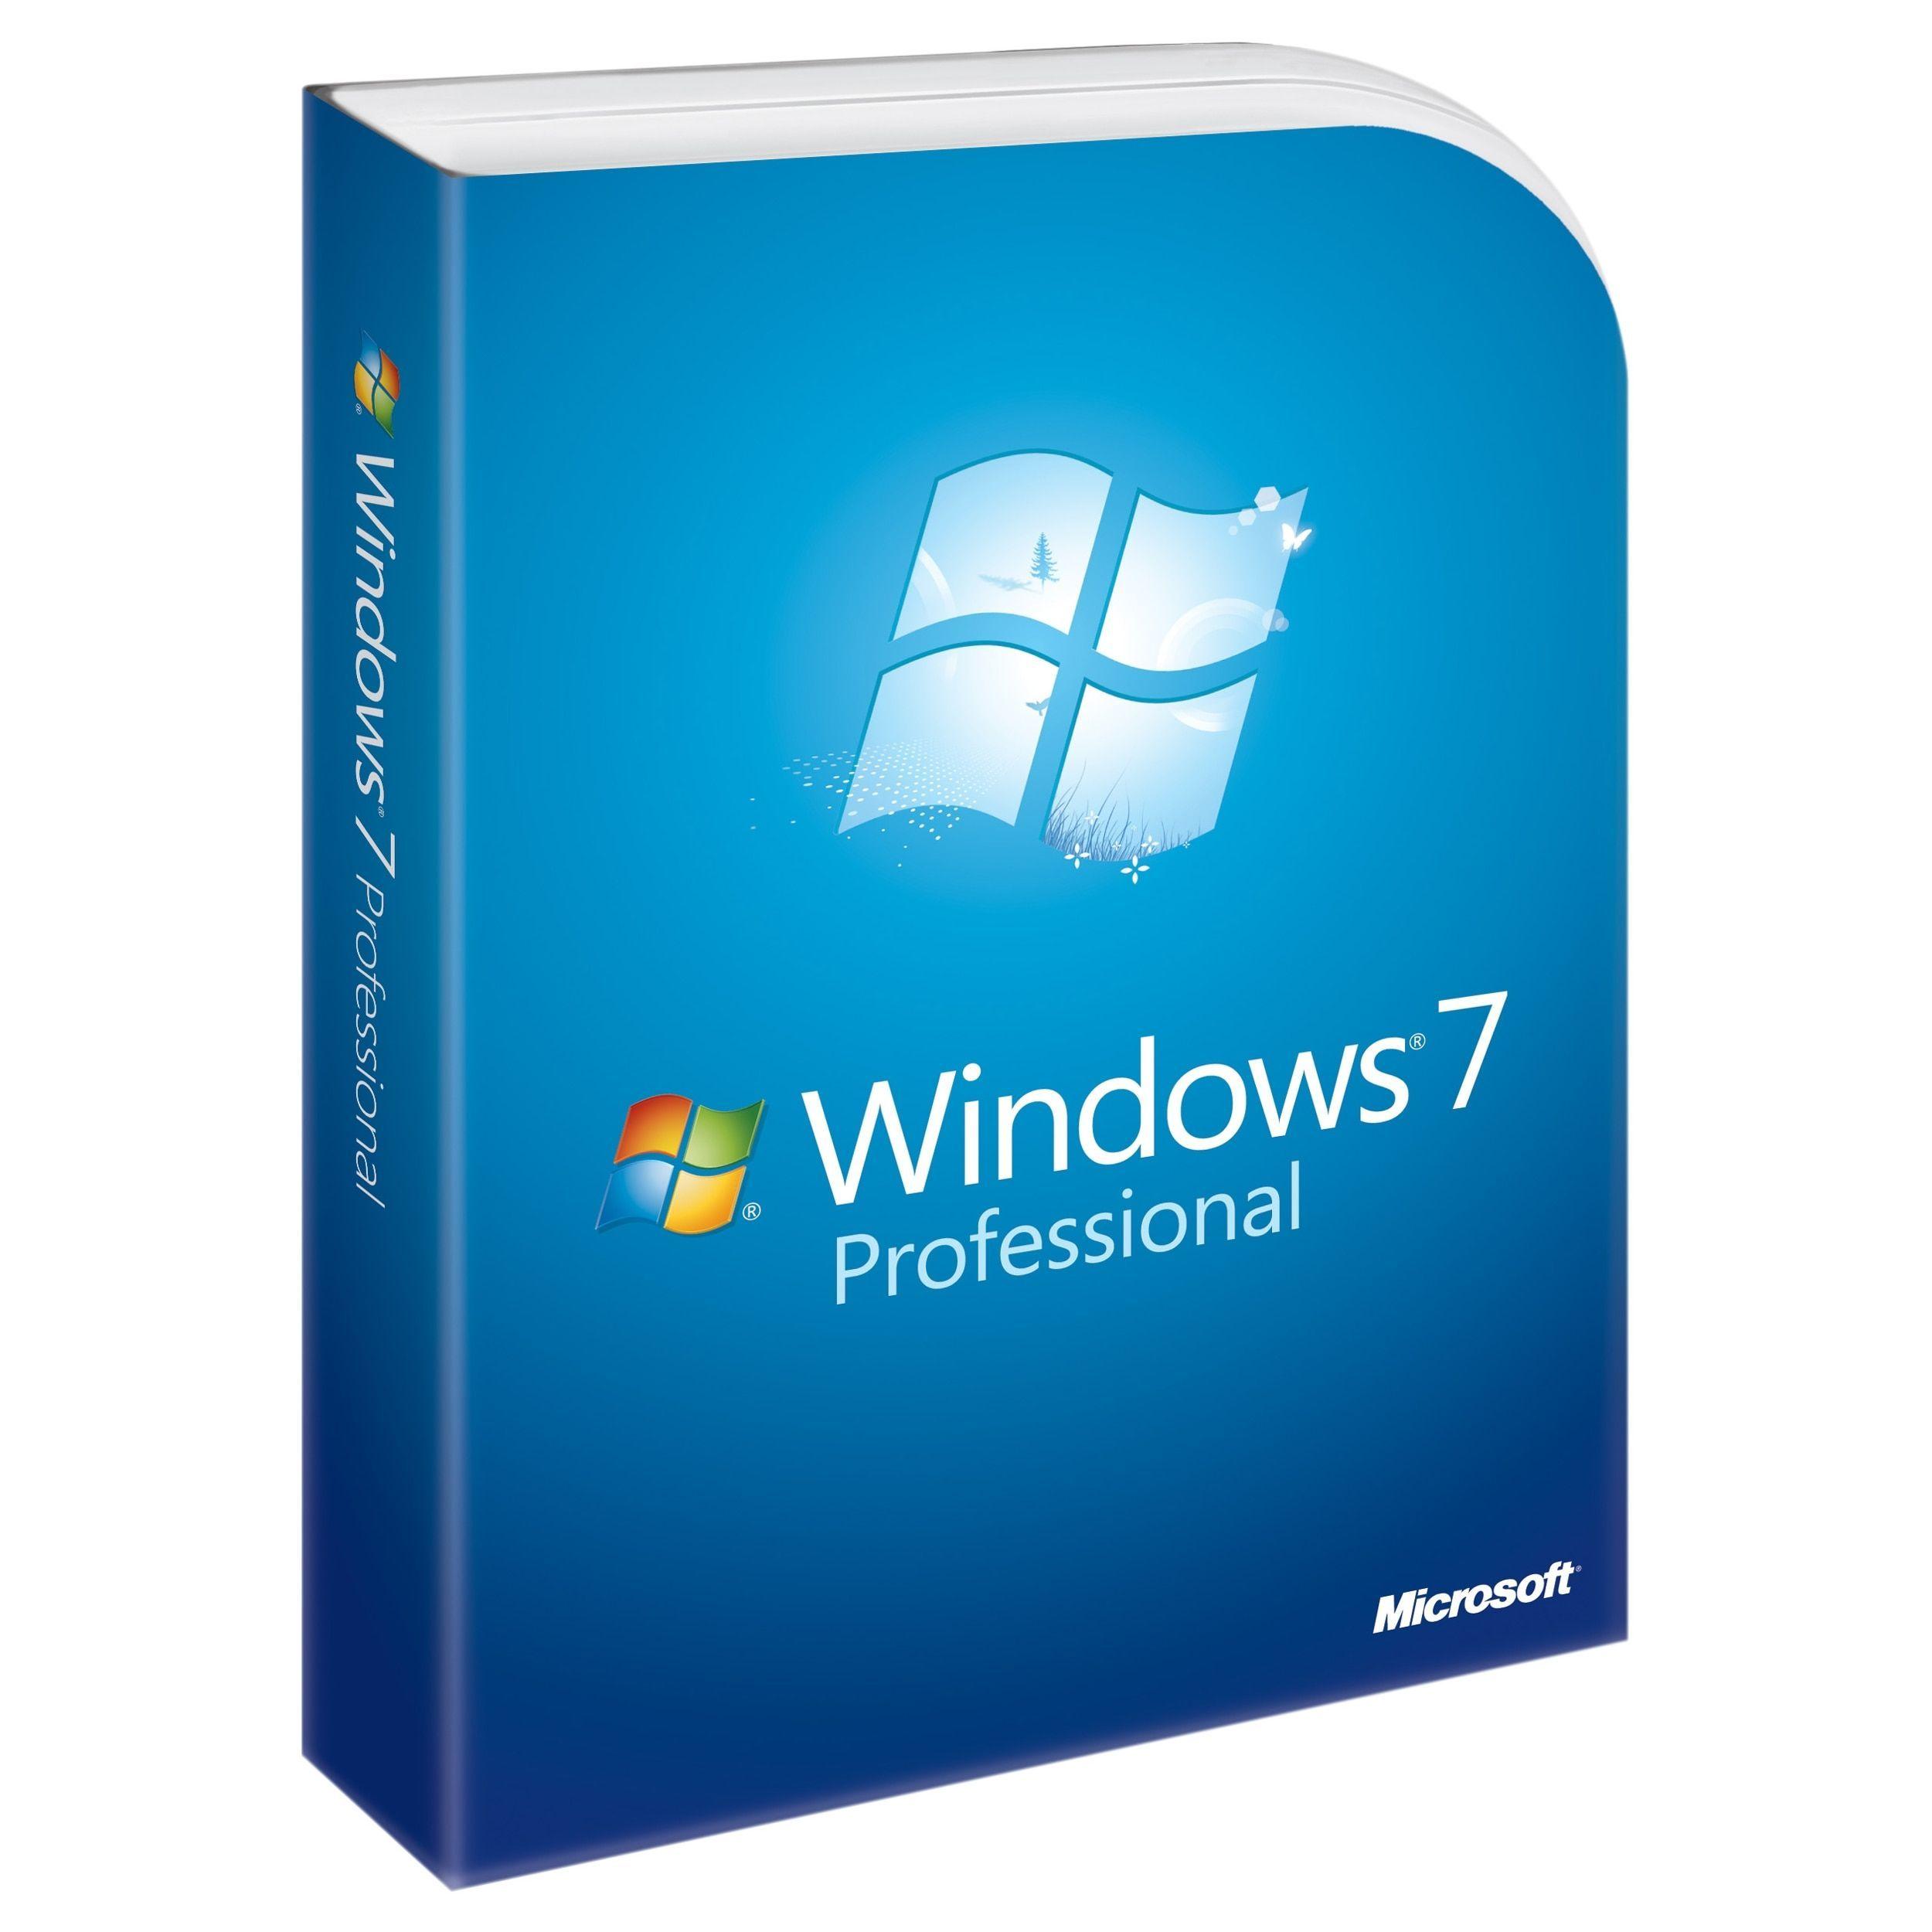 Microsoft Windows 7 Professional With Service Pack 1 32 Bit